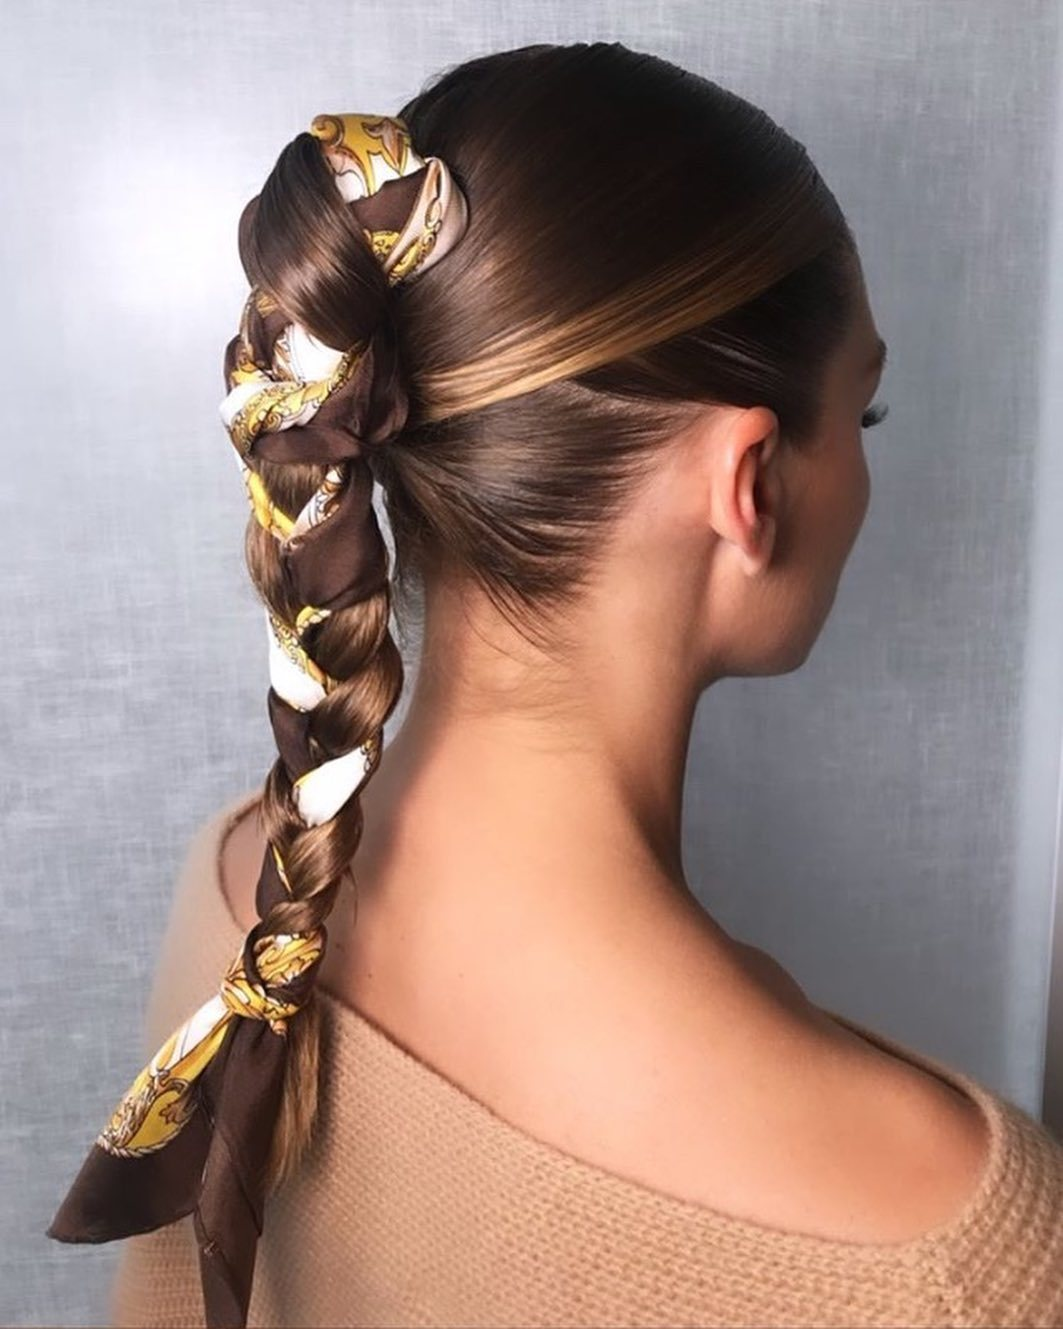 El peinado favorito de Olivia Palermo este otoño